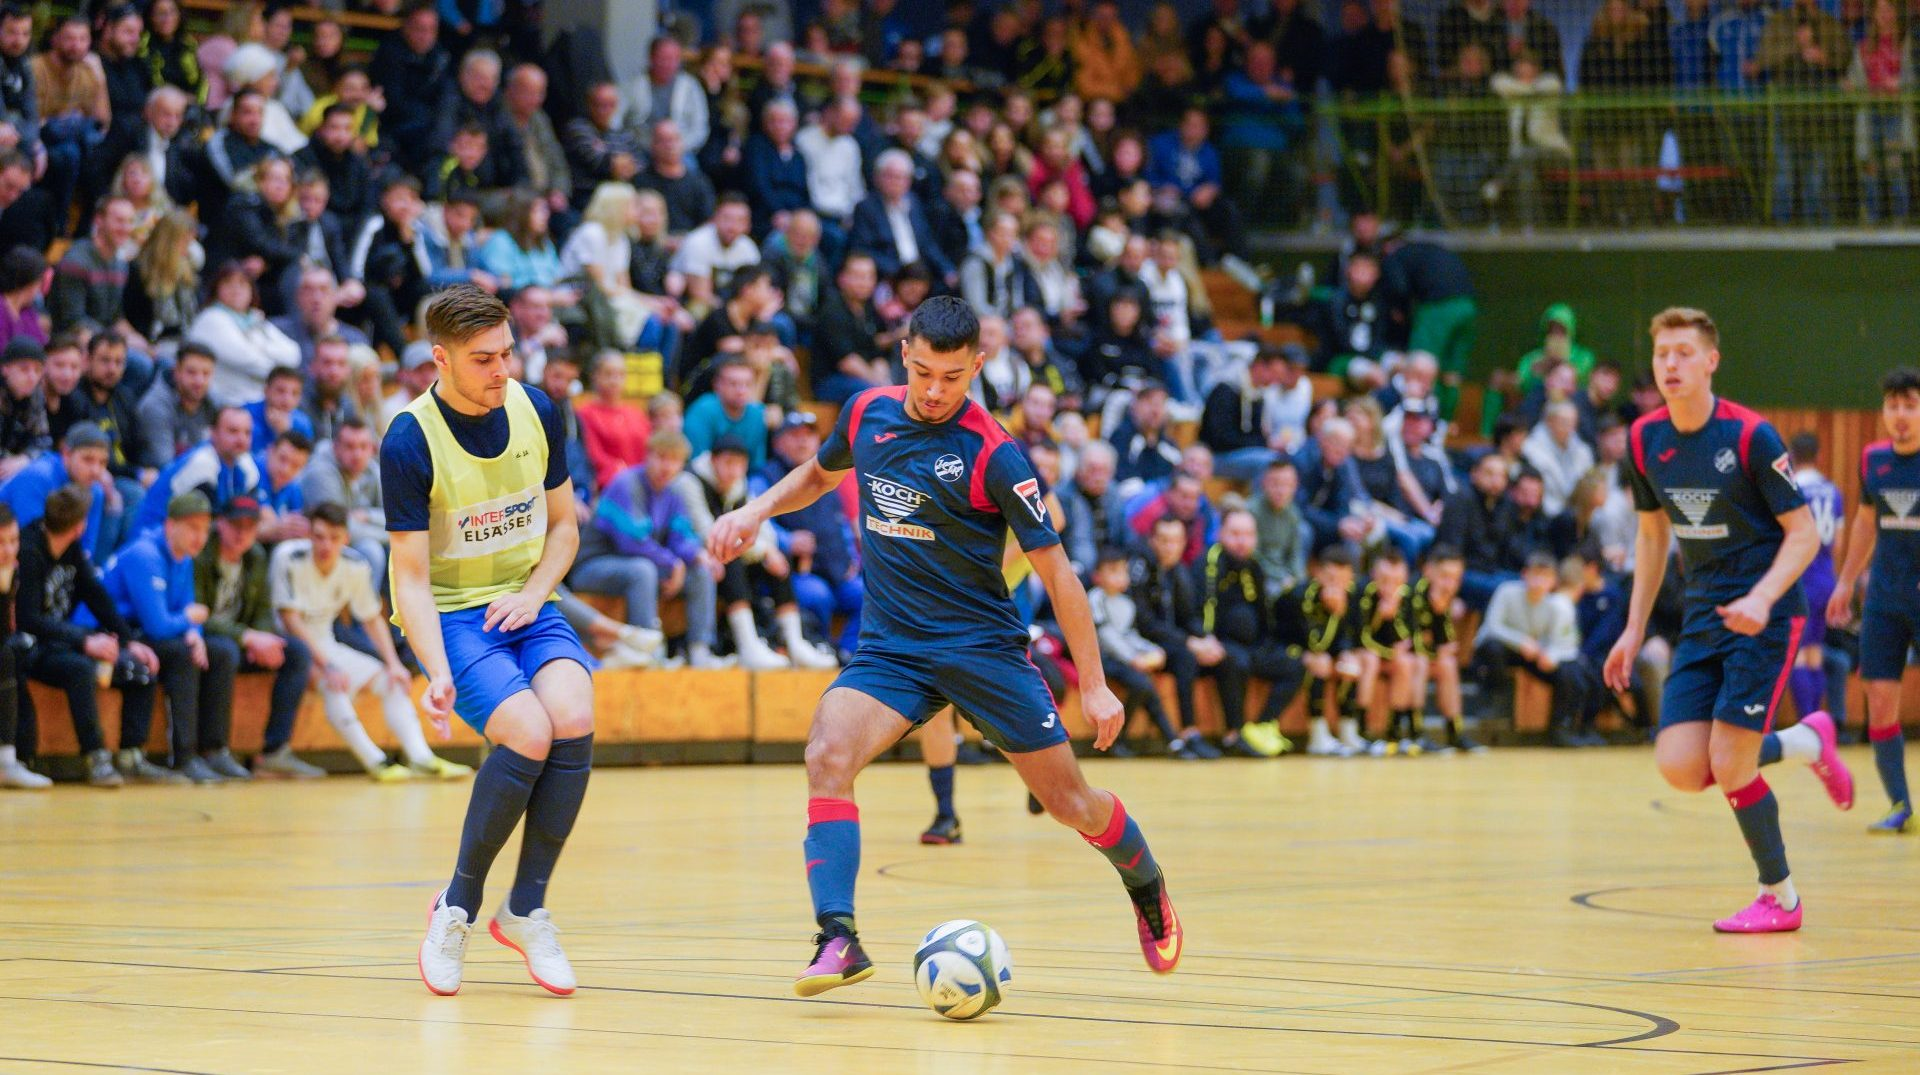 1. CfR mit mäßigem Erfolg beim Hahn-Cup des SV Büchenbronn